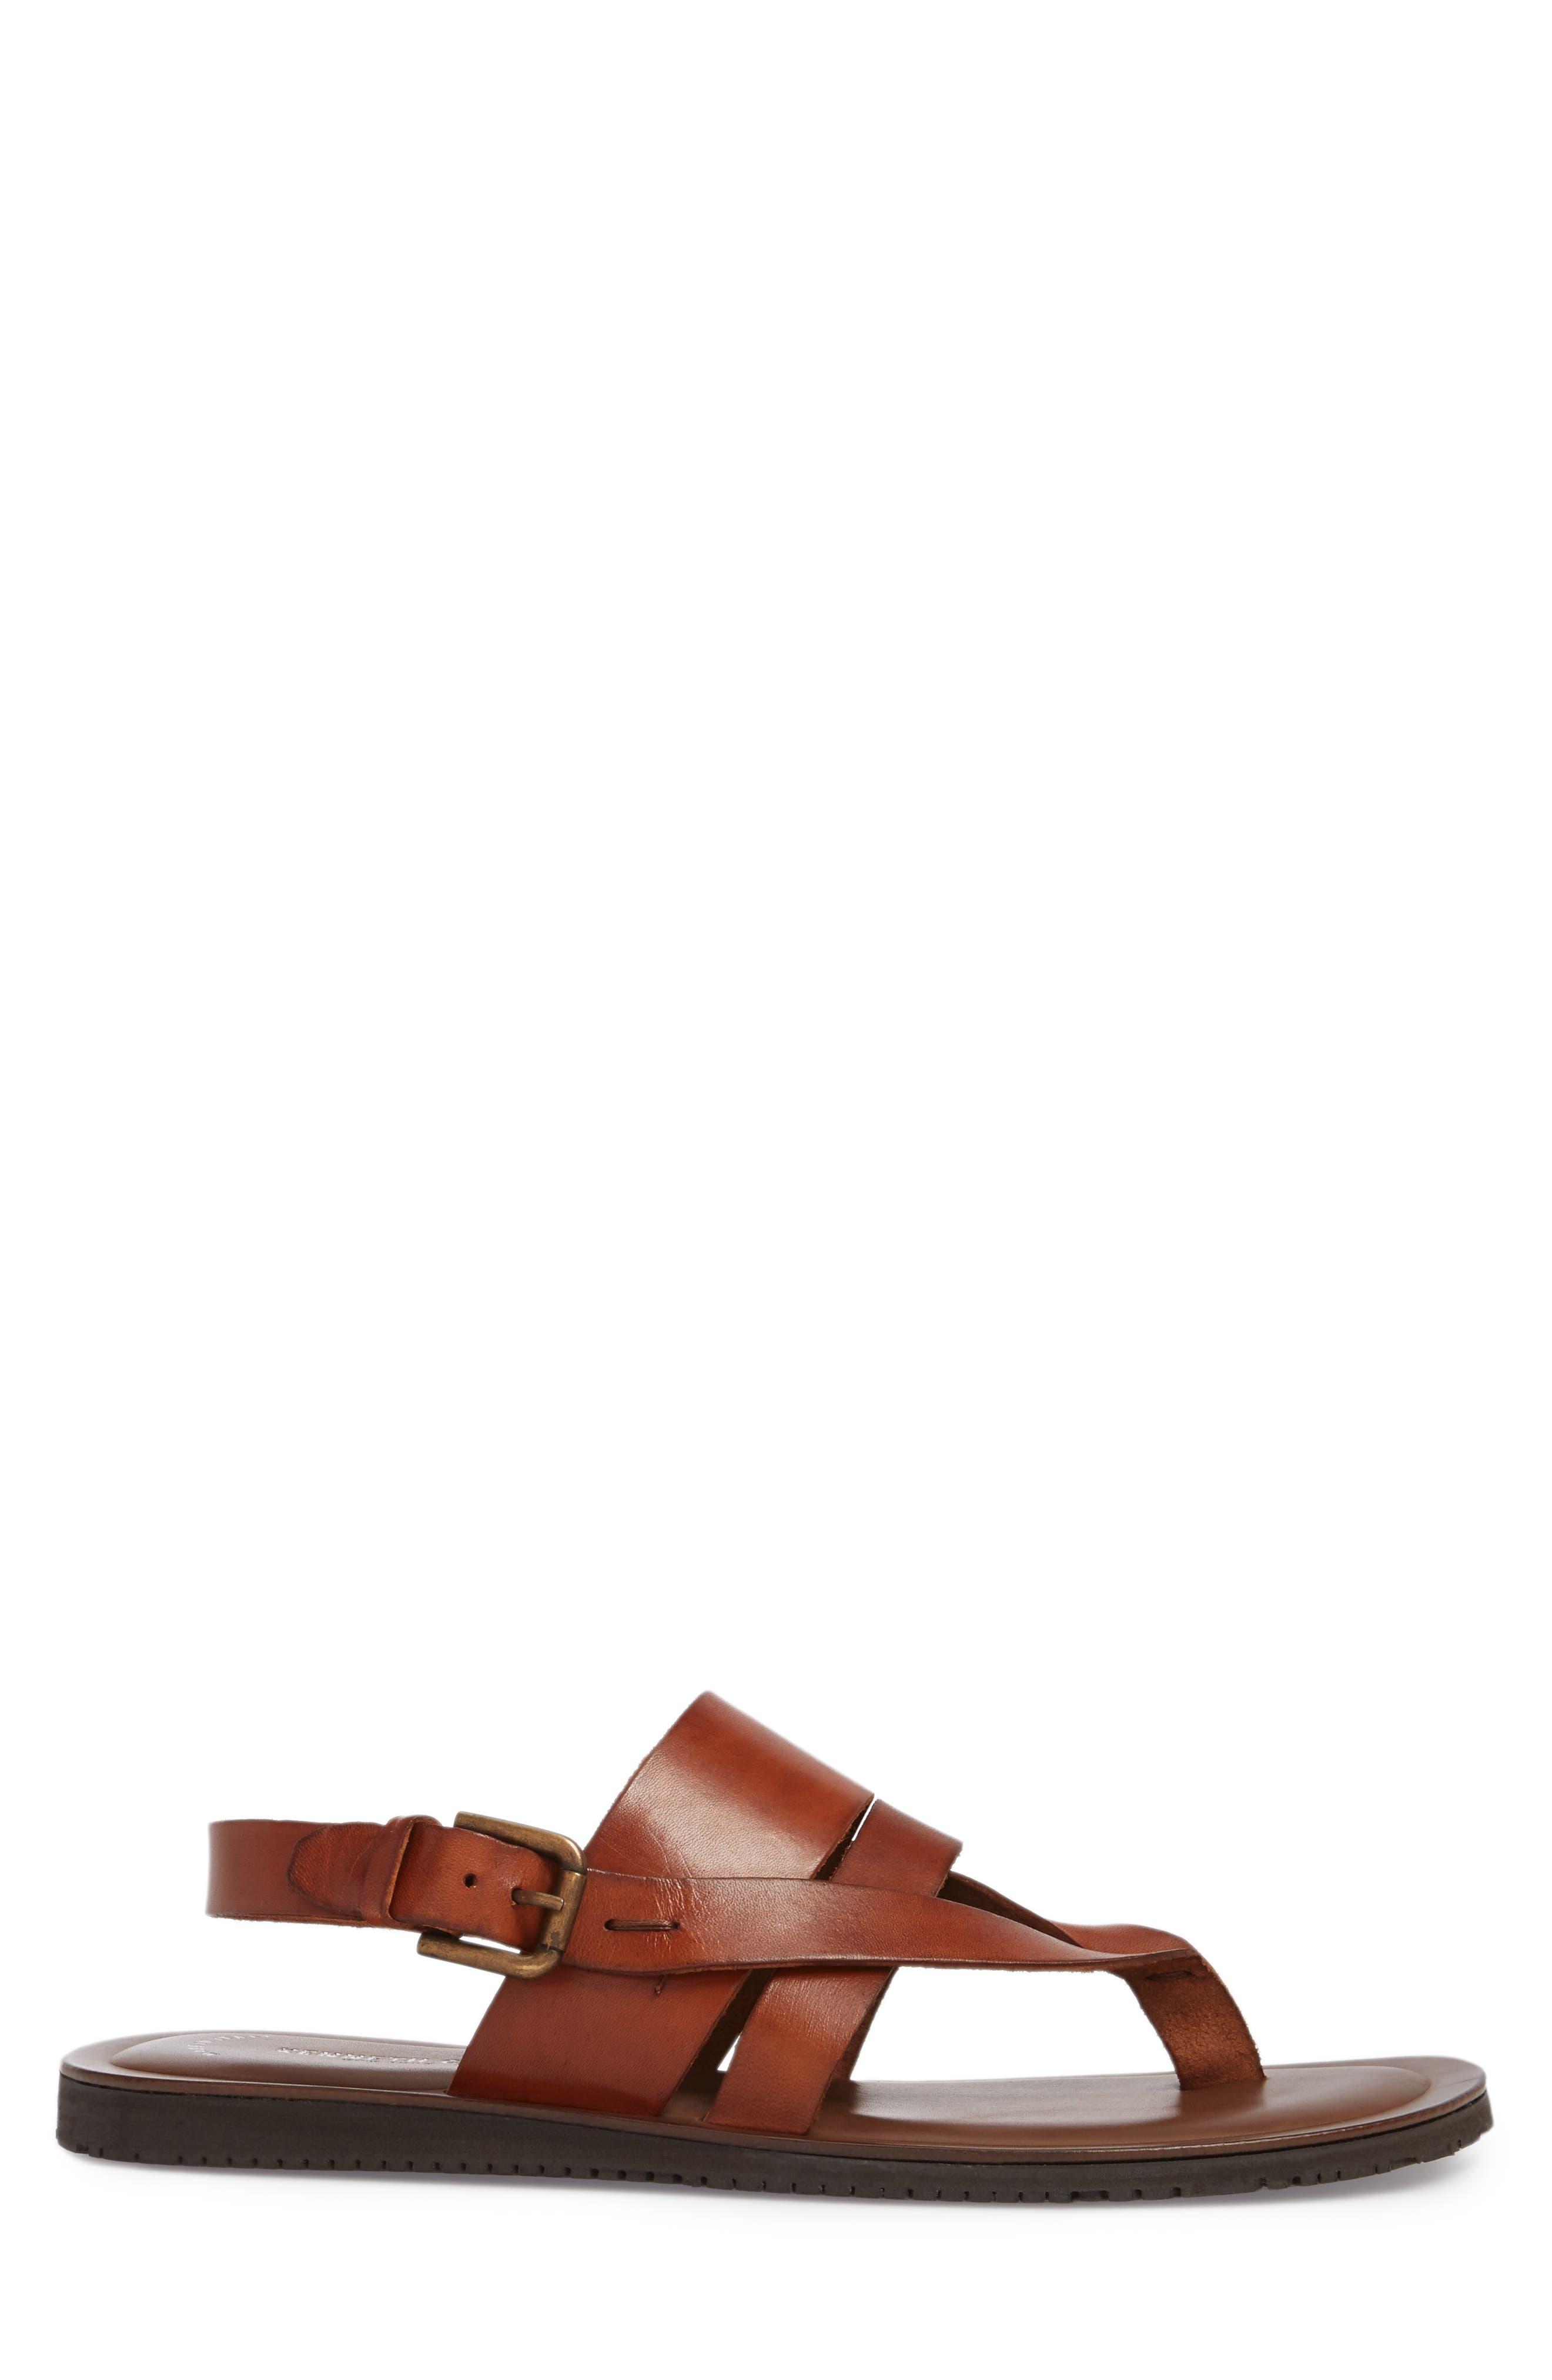 'Reel-Ist' Sandal,                             Alternate thumbnail 3, color,                             Cognac Leather